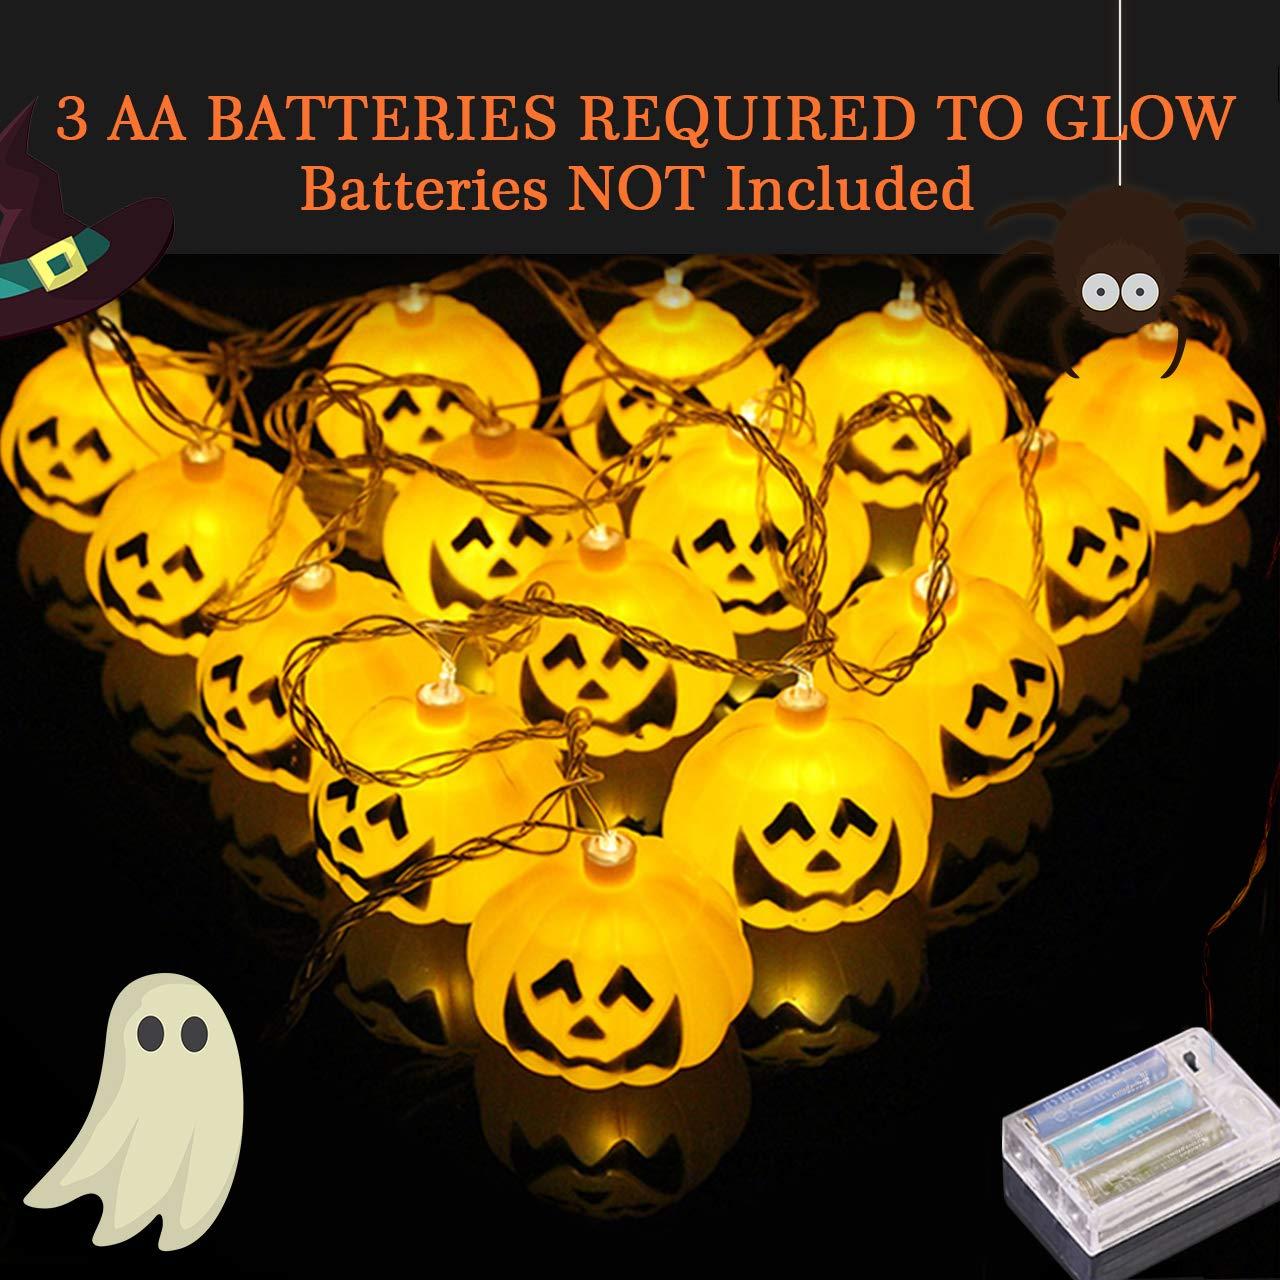 Pumpkin Lights Halloween Thanksgiving Decor Light,Halloween Thanksgiving Decorations Outdoor// Indoor 6.5 FT 20 LED Battery Powered Pumpkin String Lights Jack-O-Lantern for Party,Patio.Trick or Treat